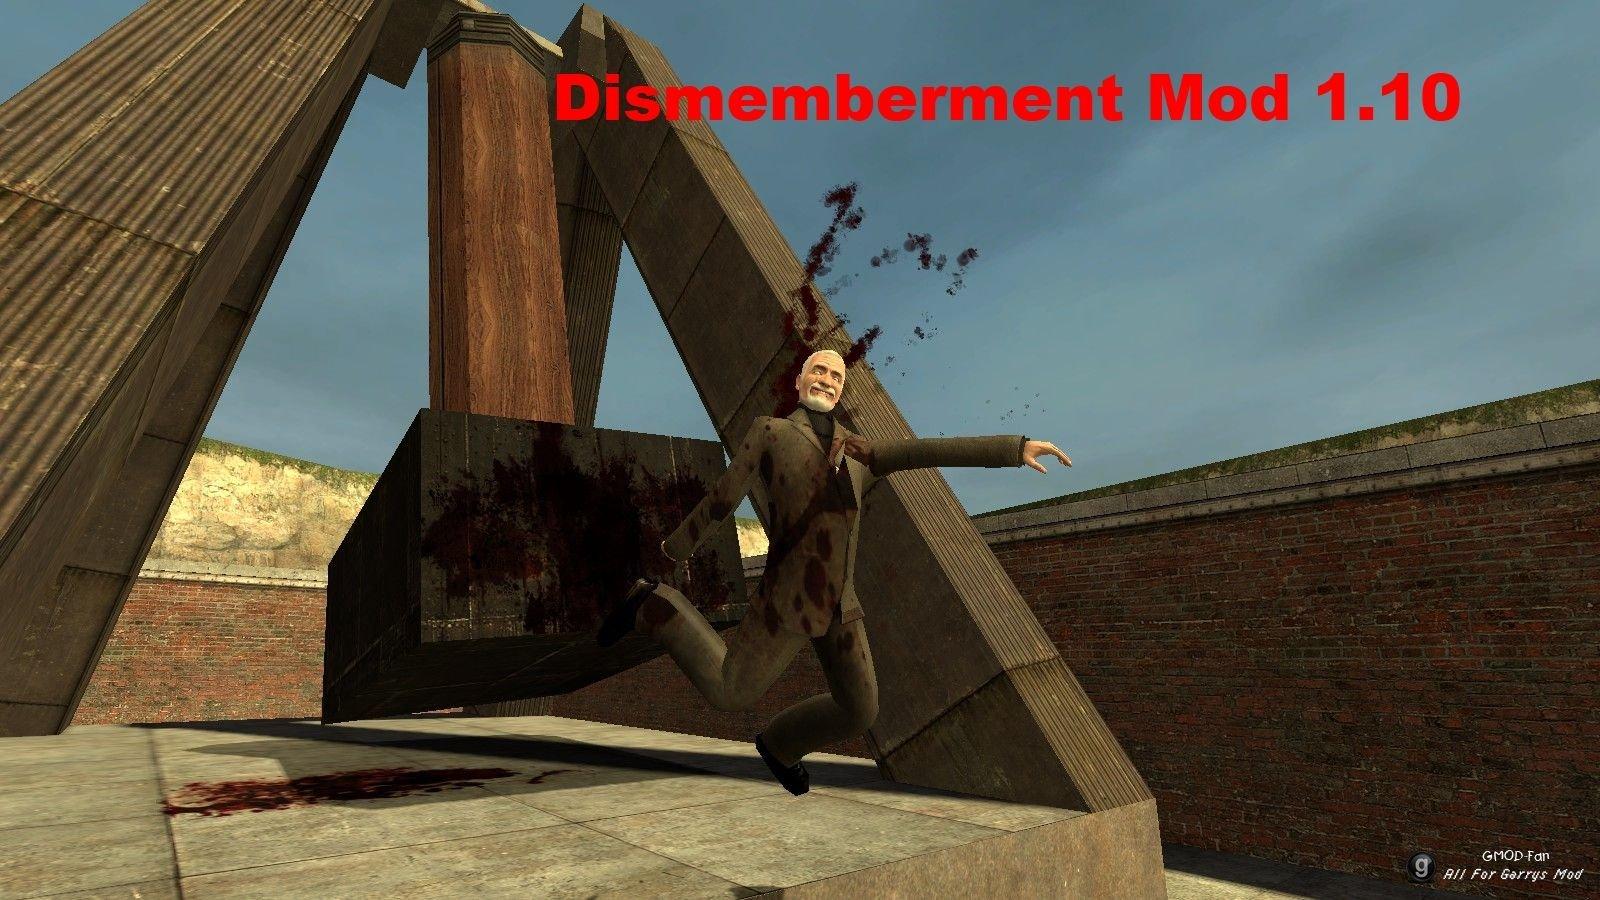 Скачать мод dismemberment mod для гаррис мод